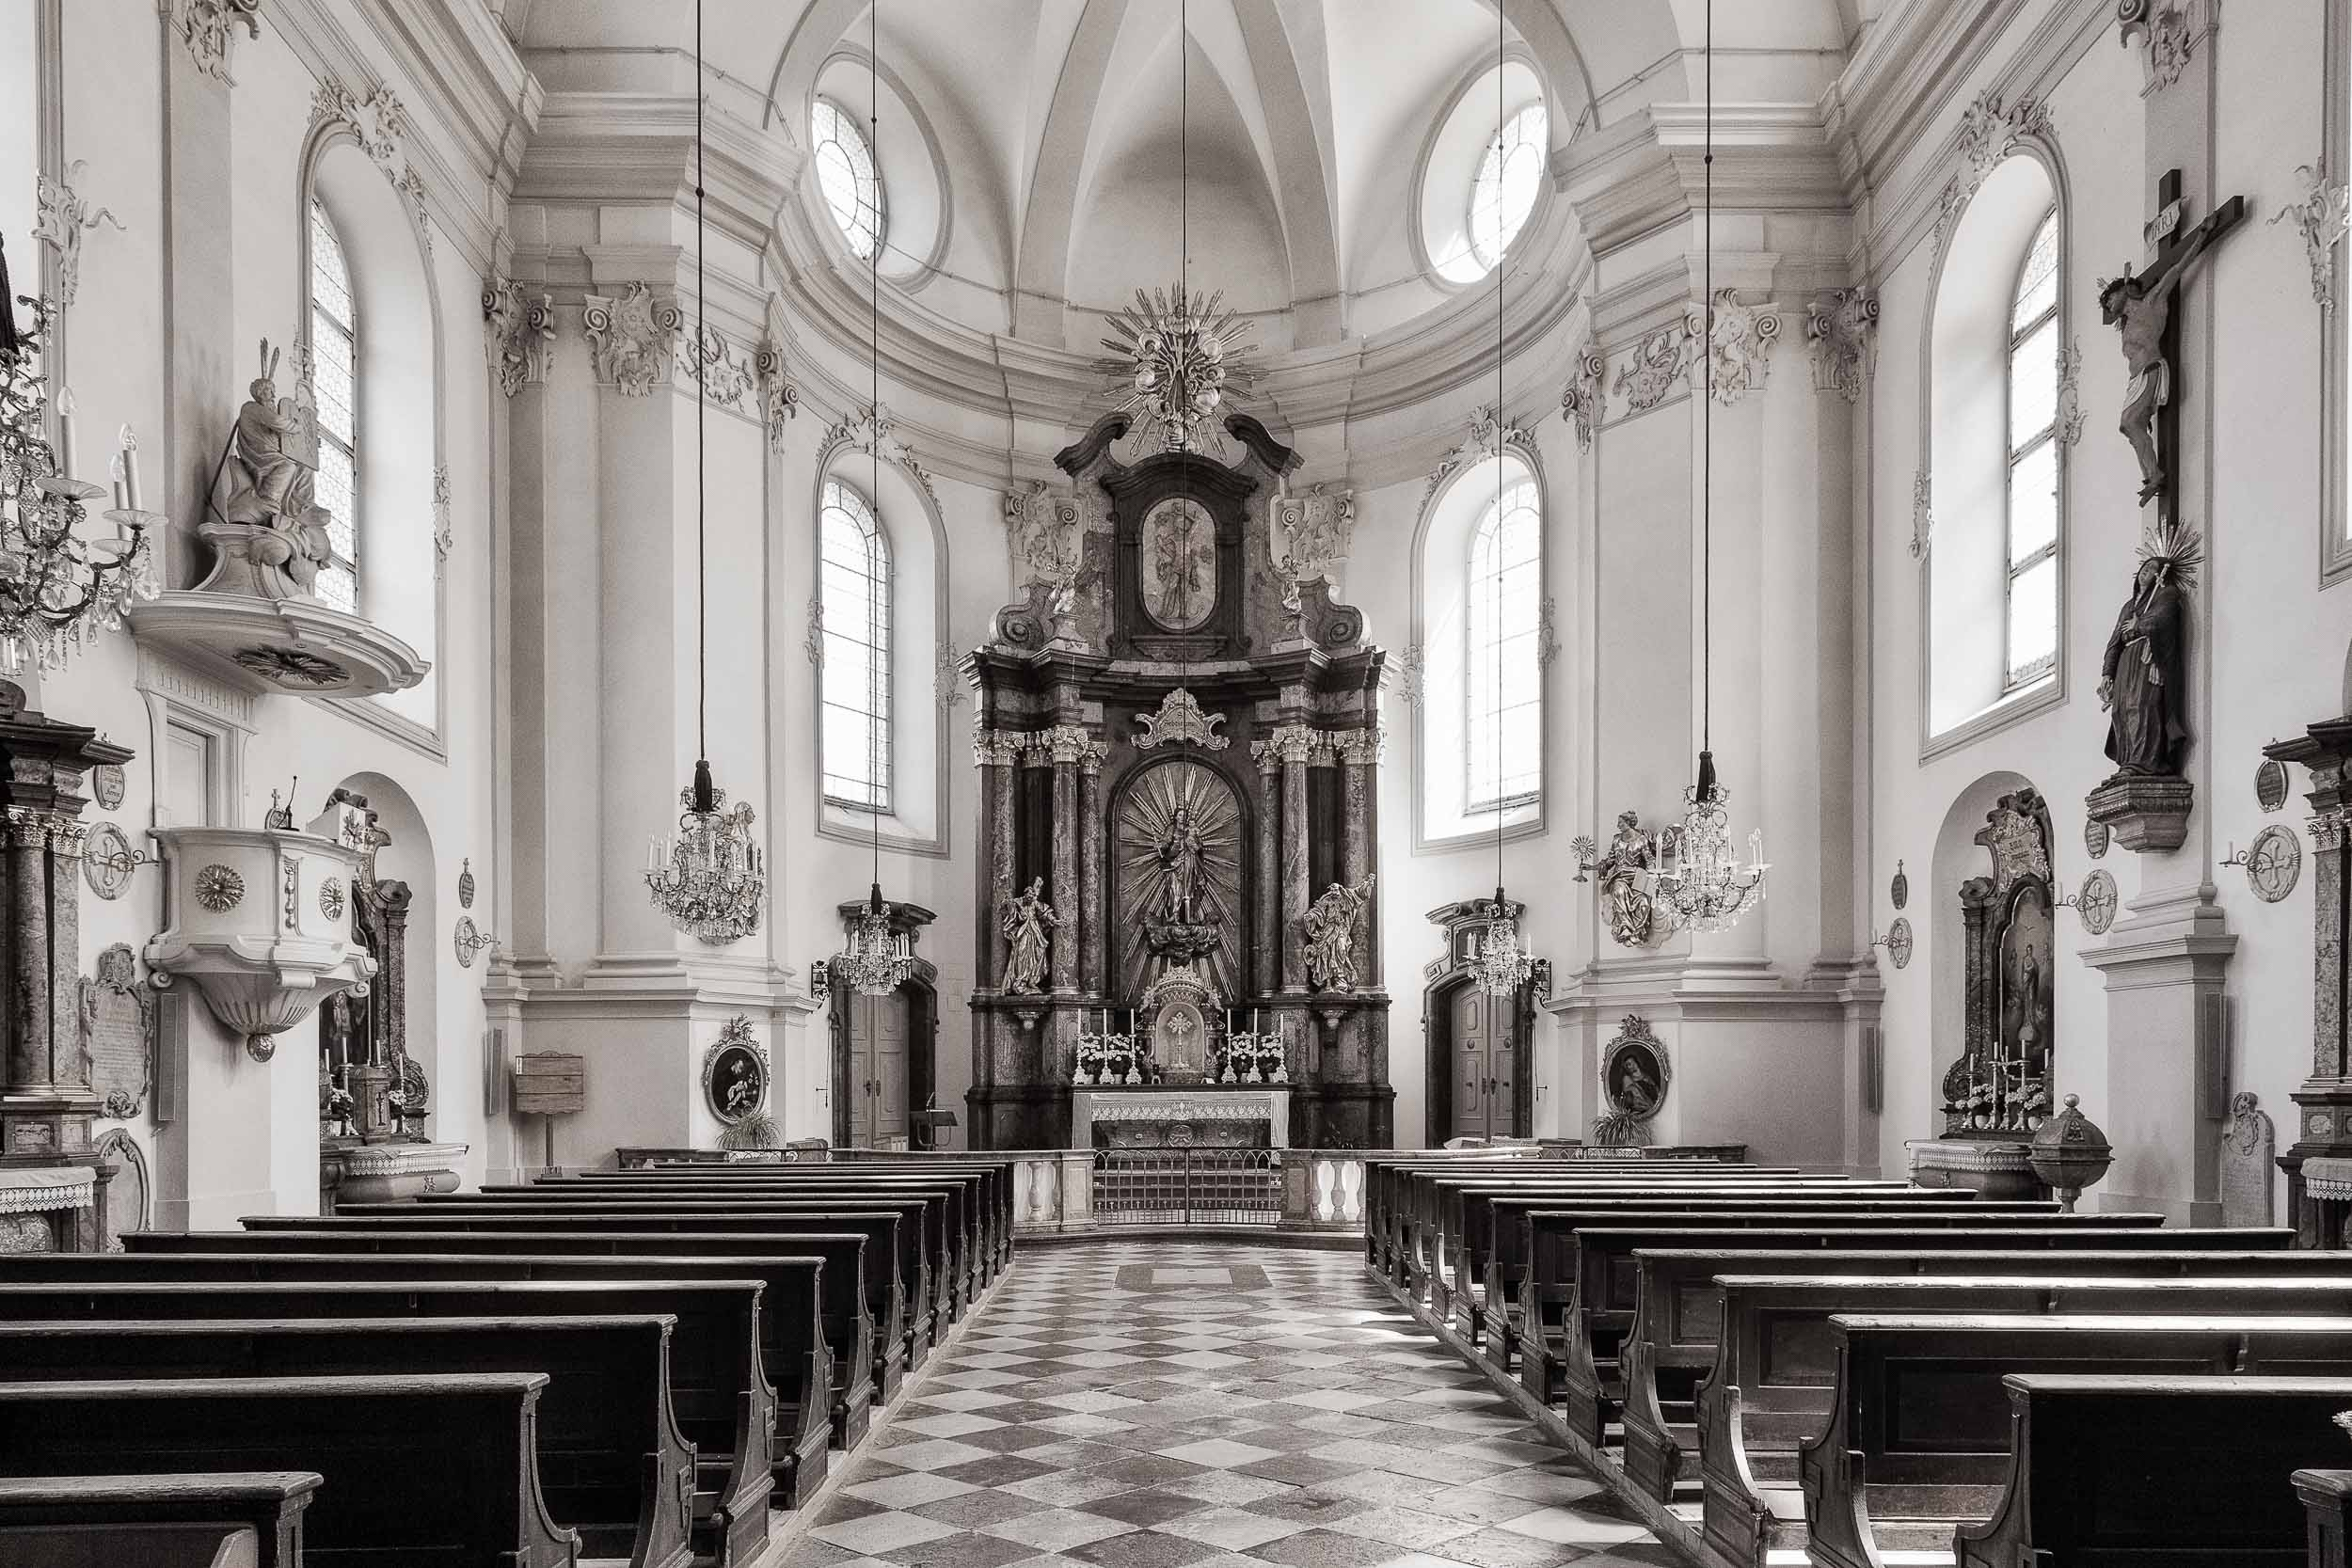 An interior    warm tone black and white    view of the beautiful    St. Sebastian's Church    in    Salzburg, Austria   .